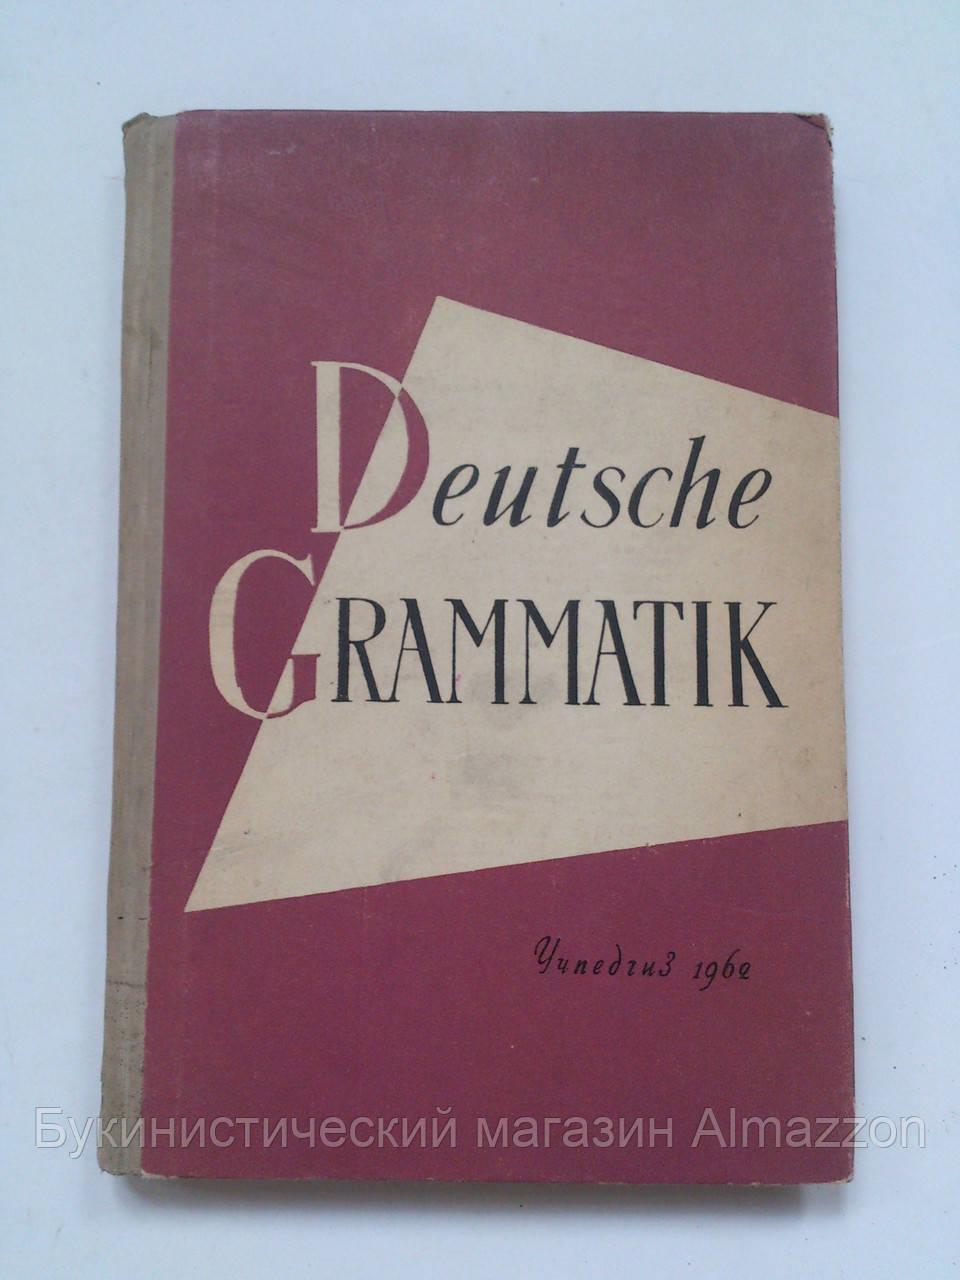 Deutsche Grammatik Учпедгиз 1962 год. Немецкая грамматика